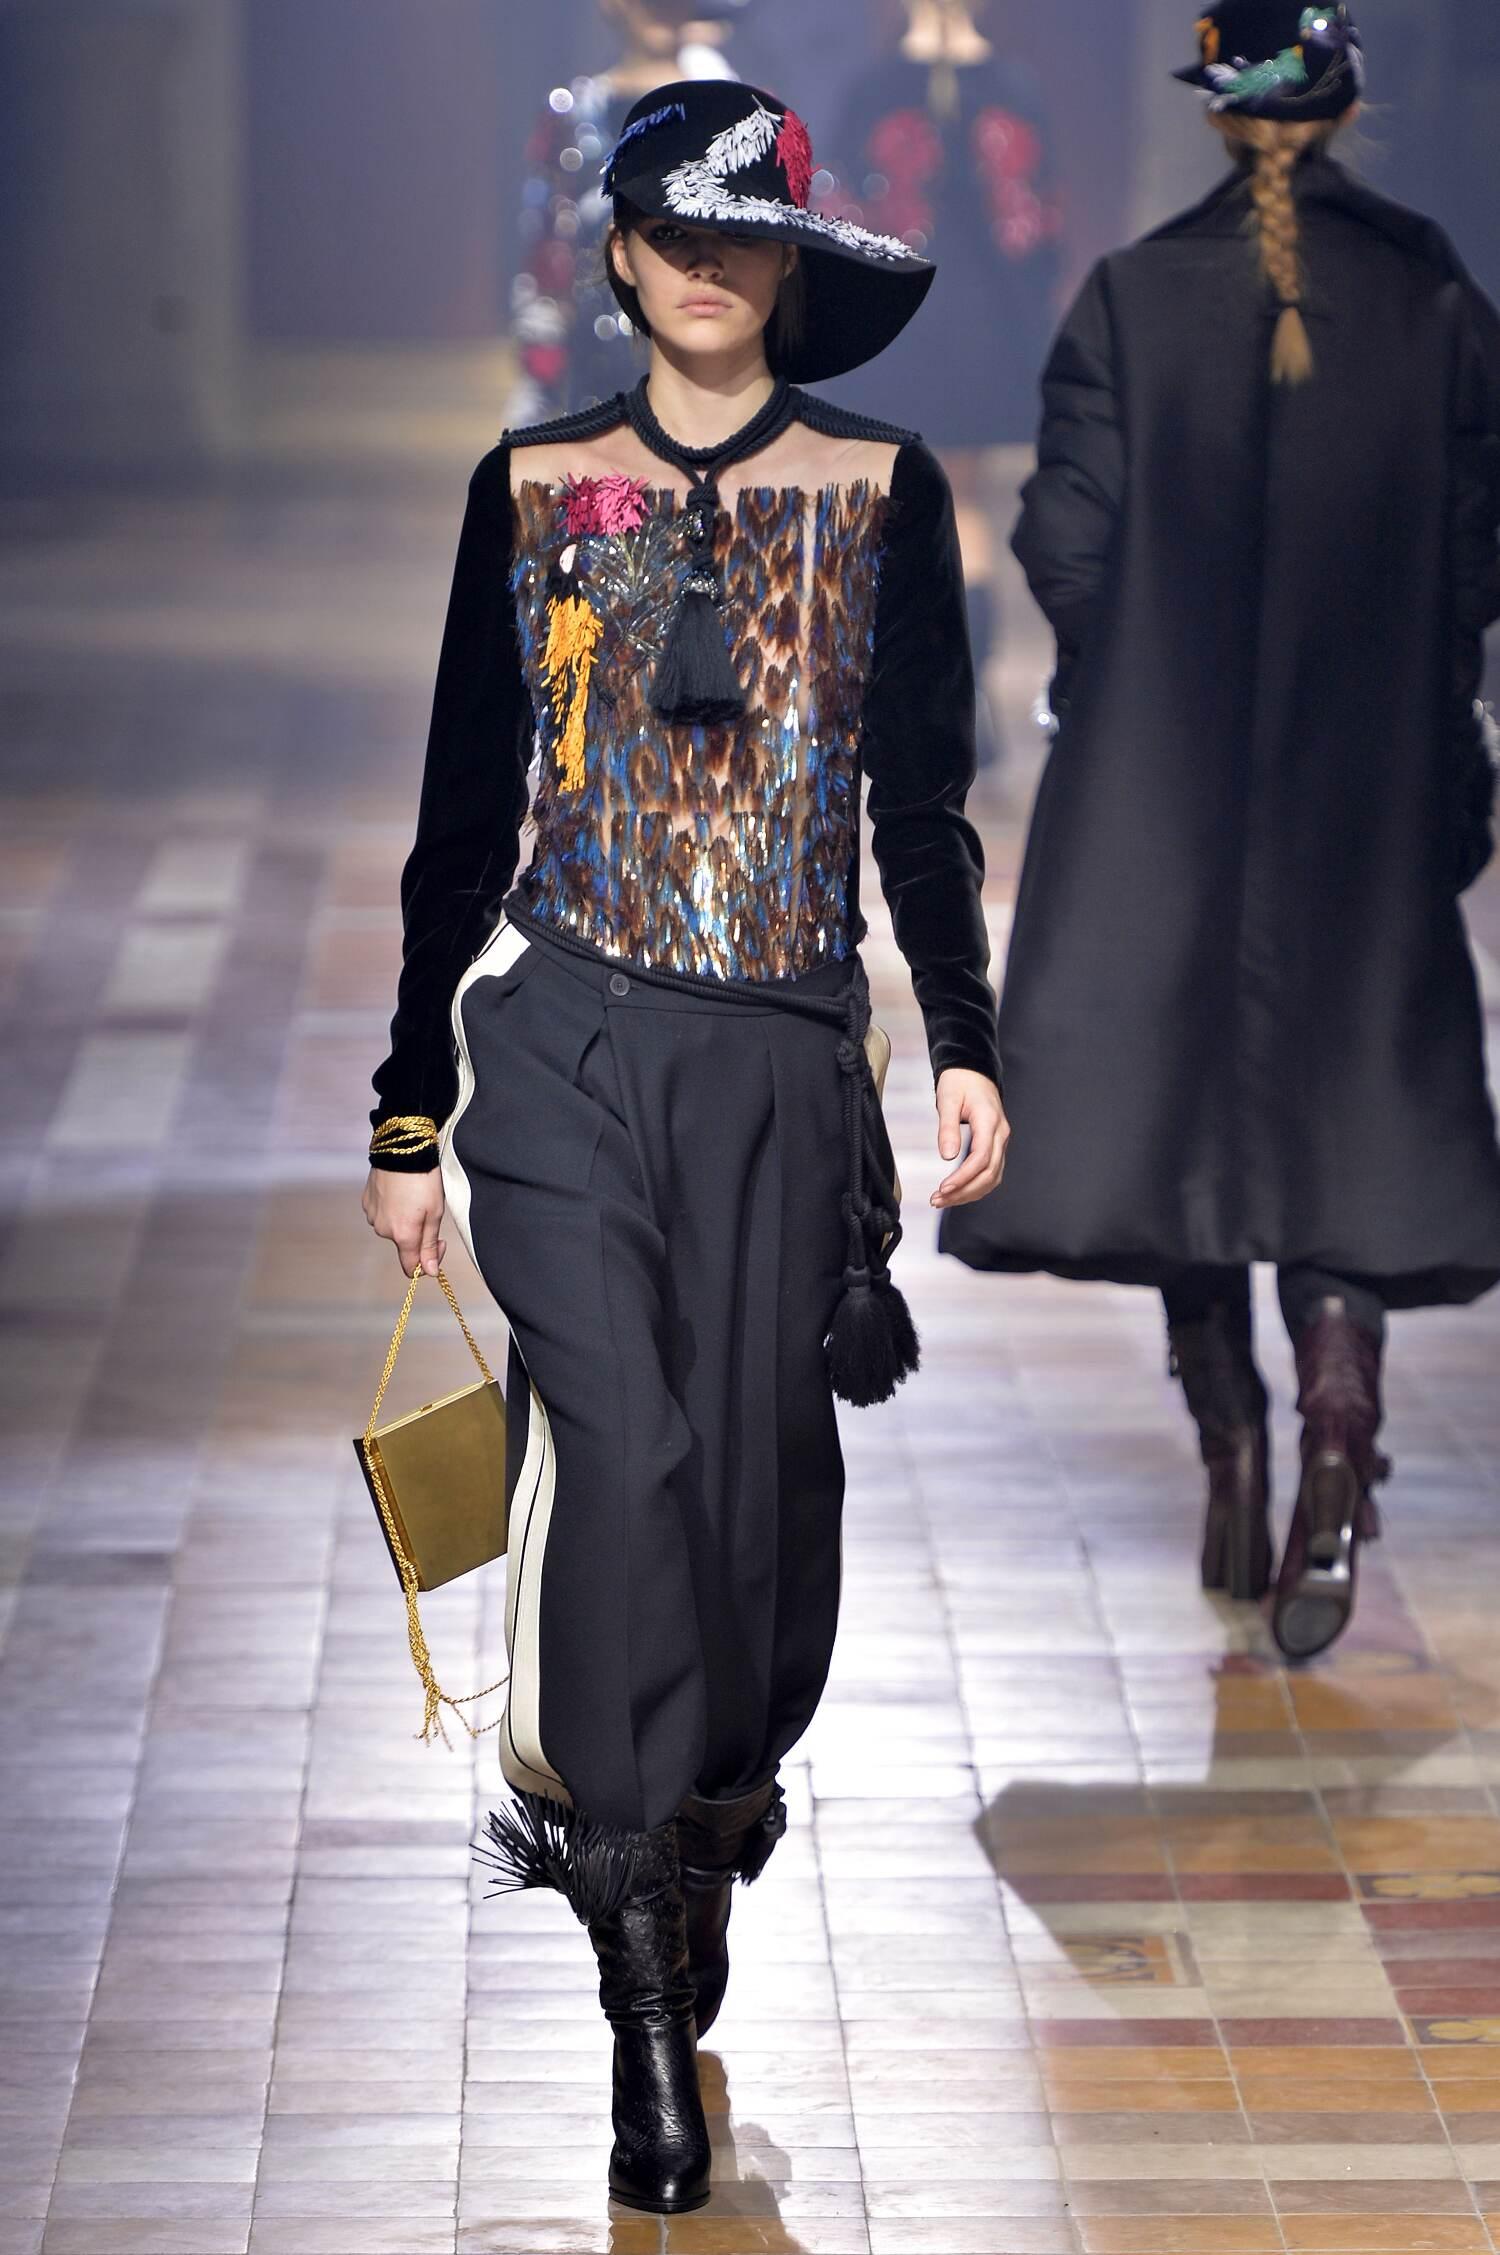 2015 2016 Fall Fashion Woman Lanvin Collection